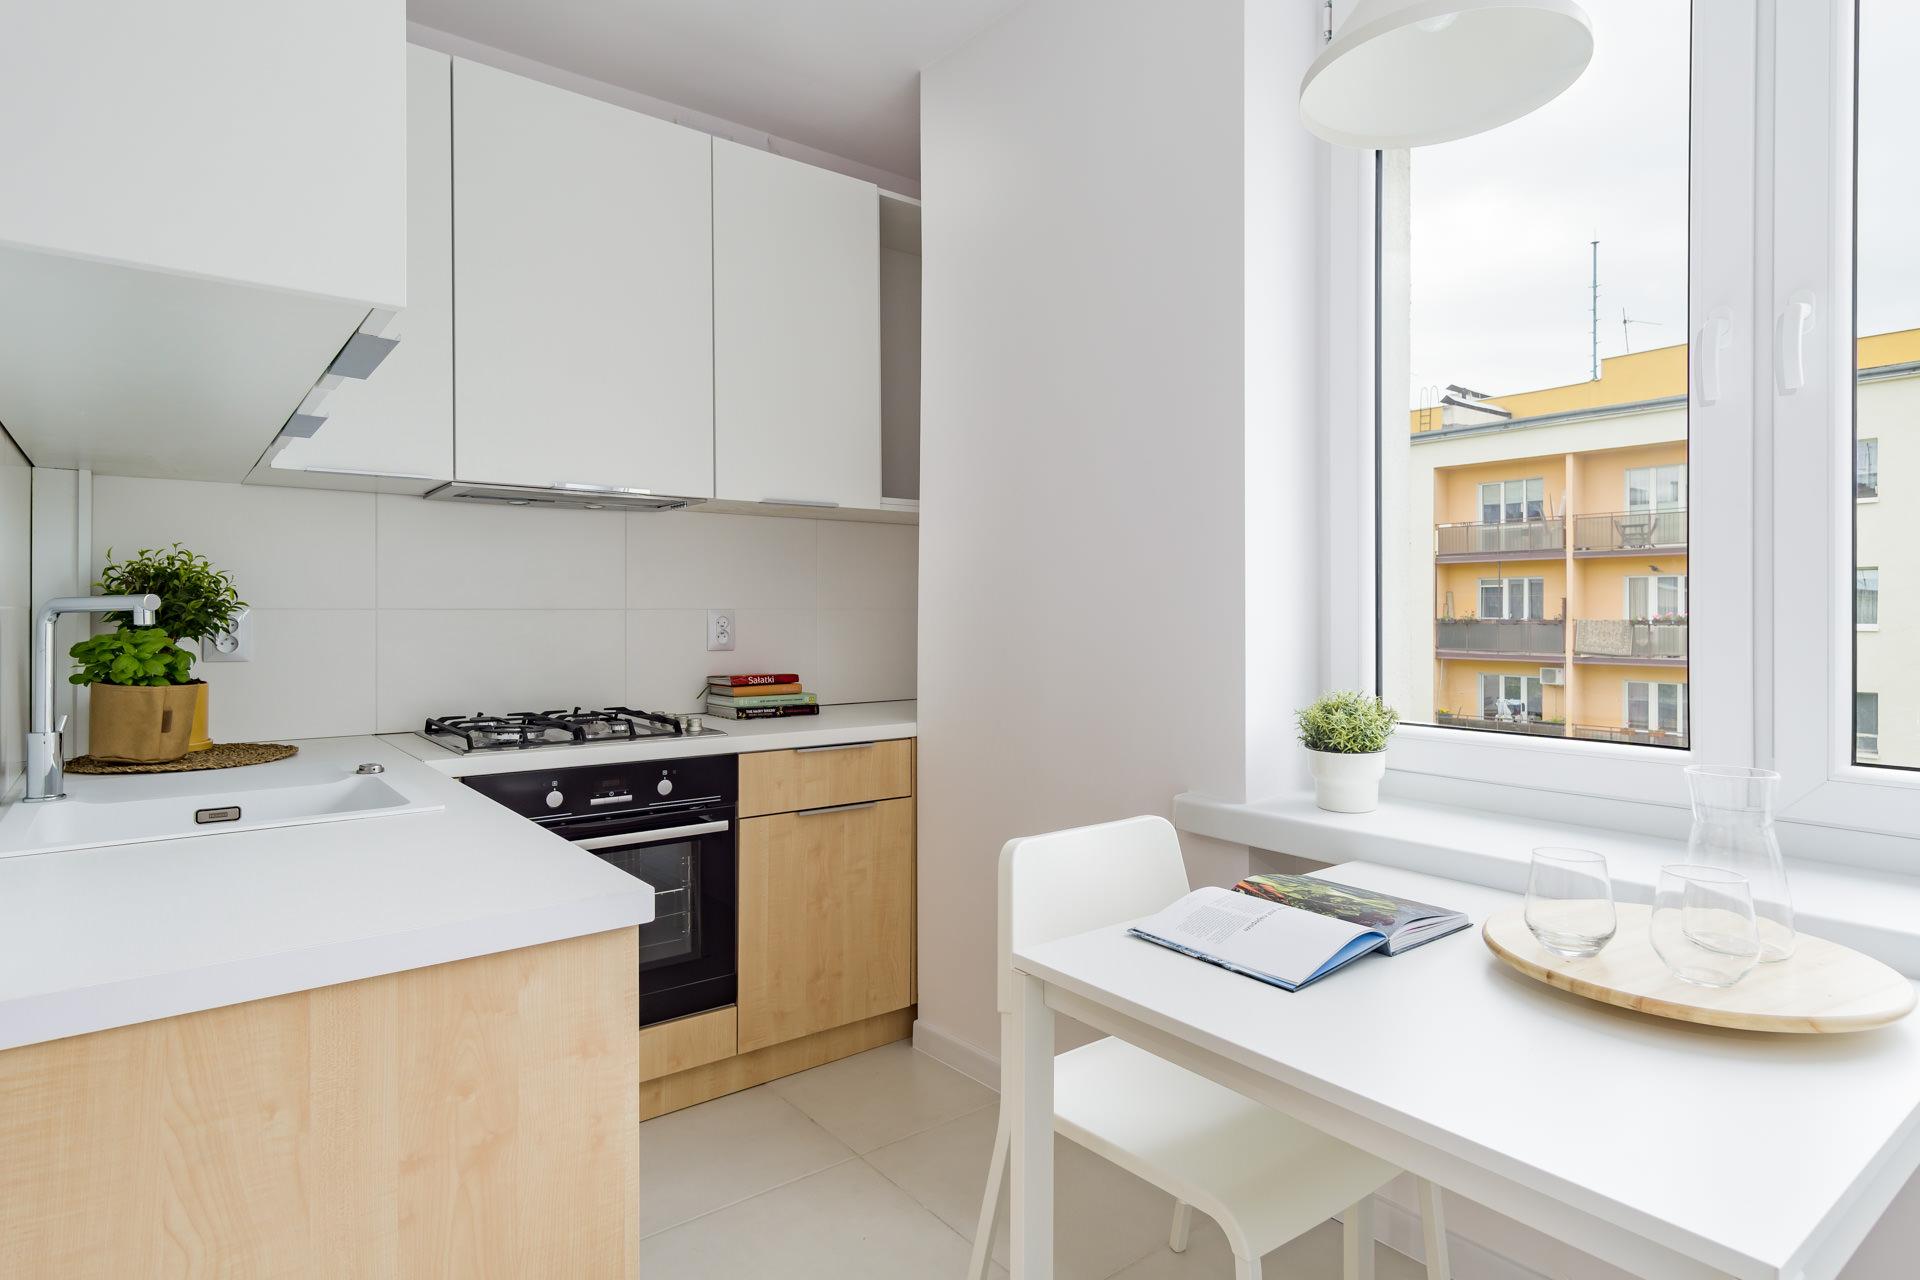 projekt wnętrz mieszkania - kuchnia